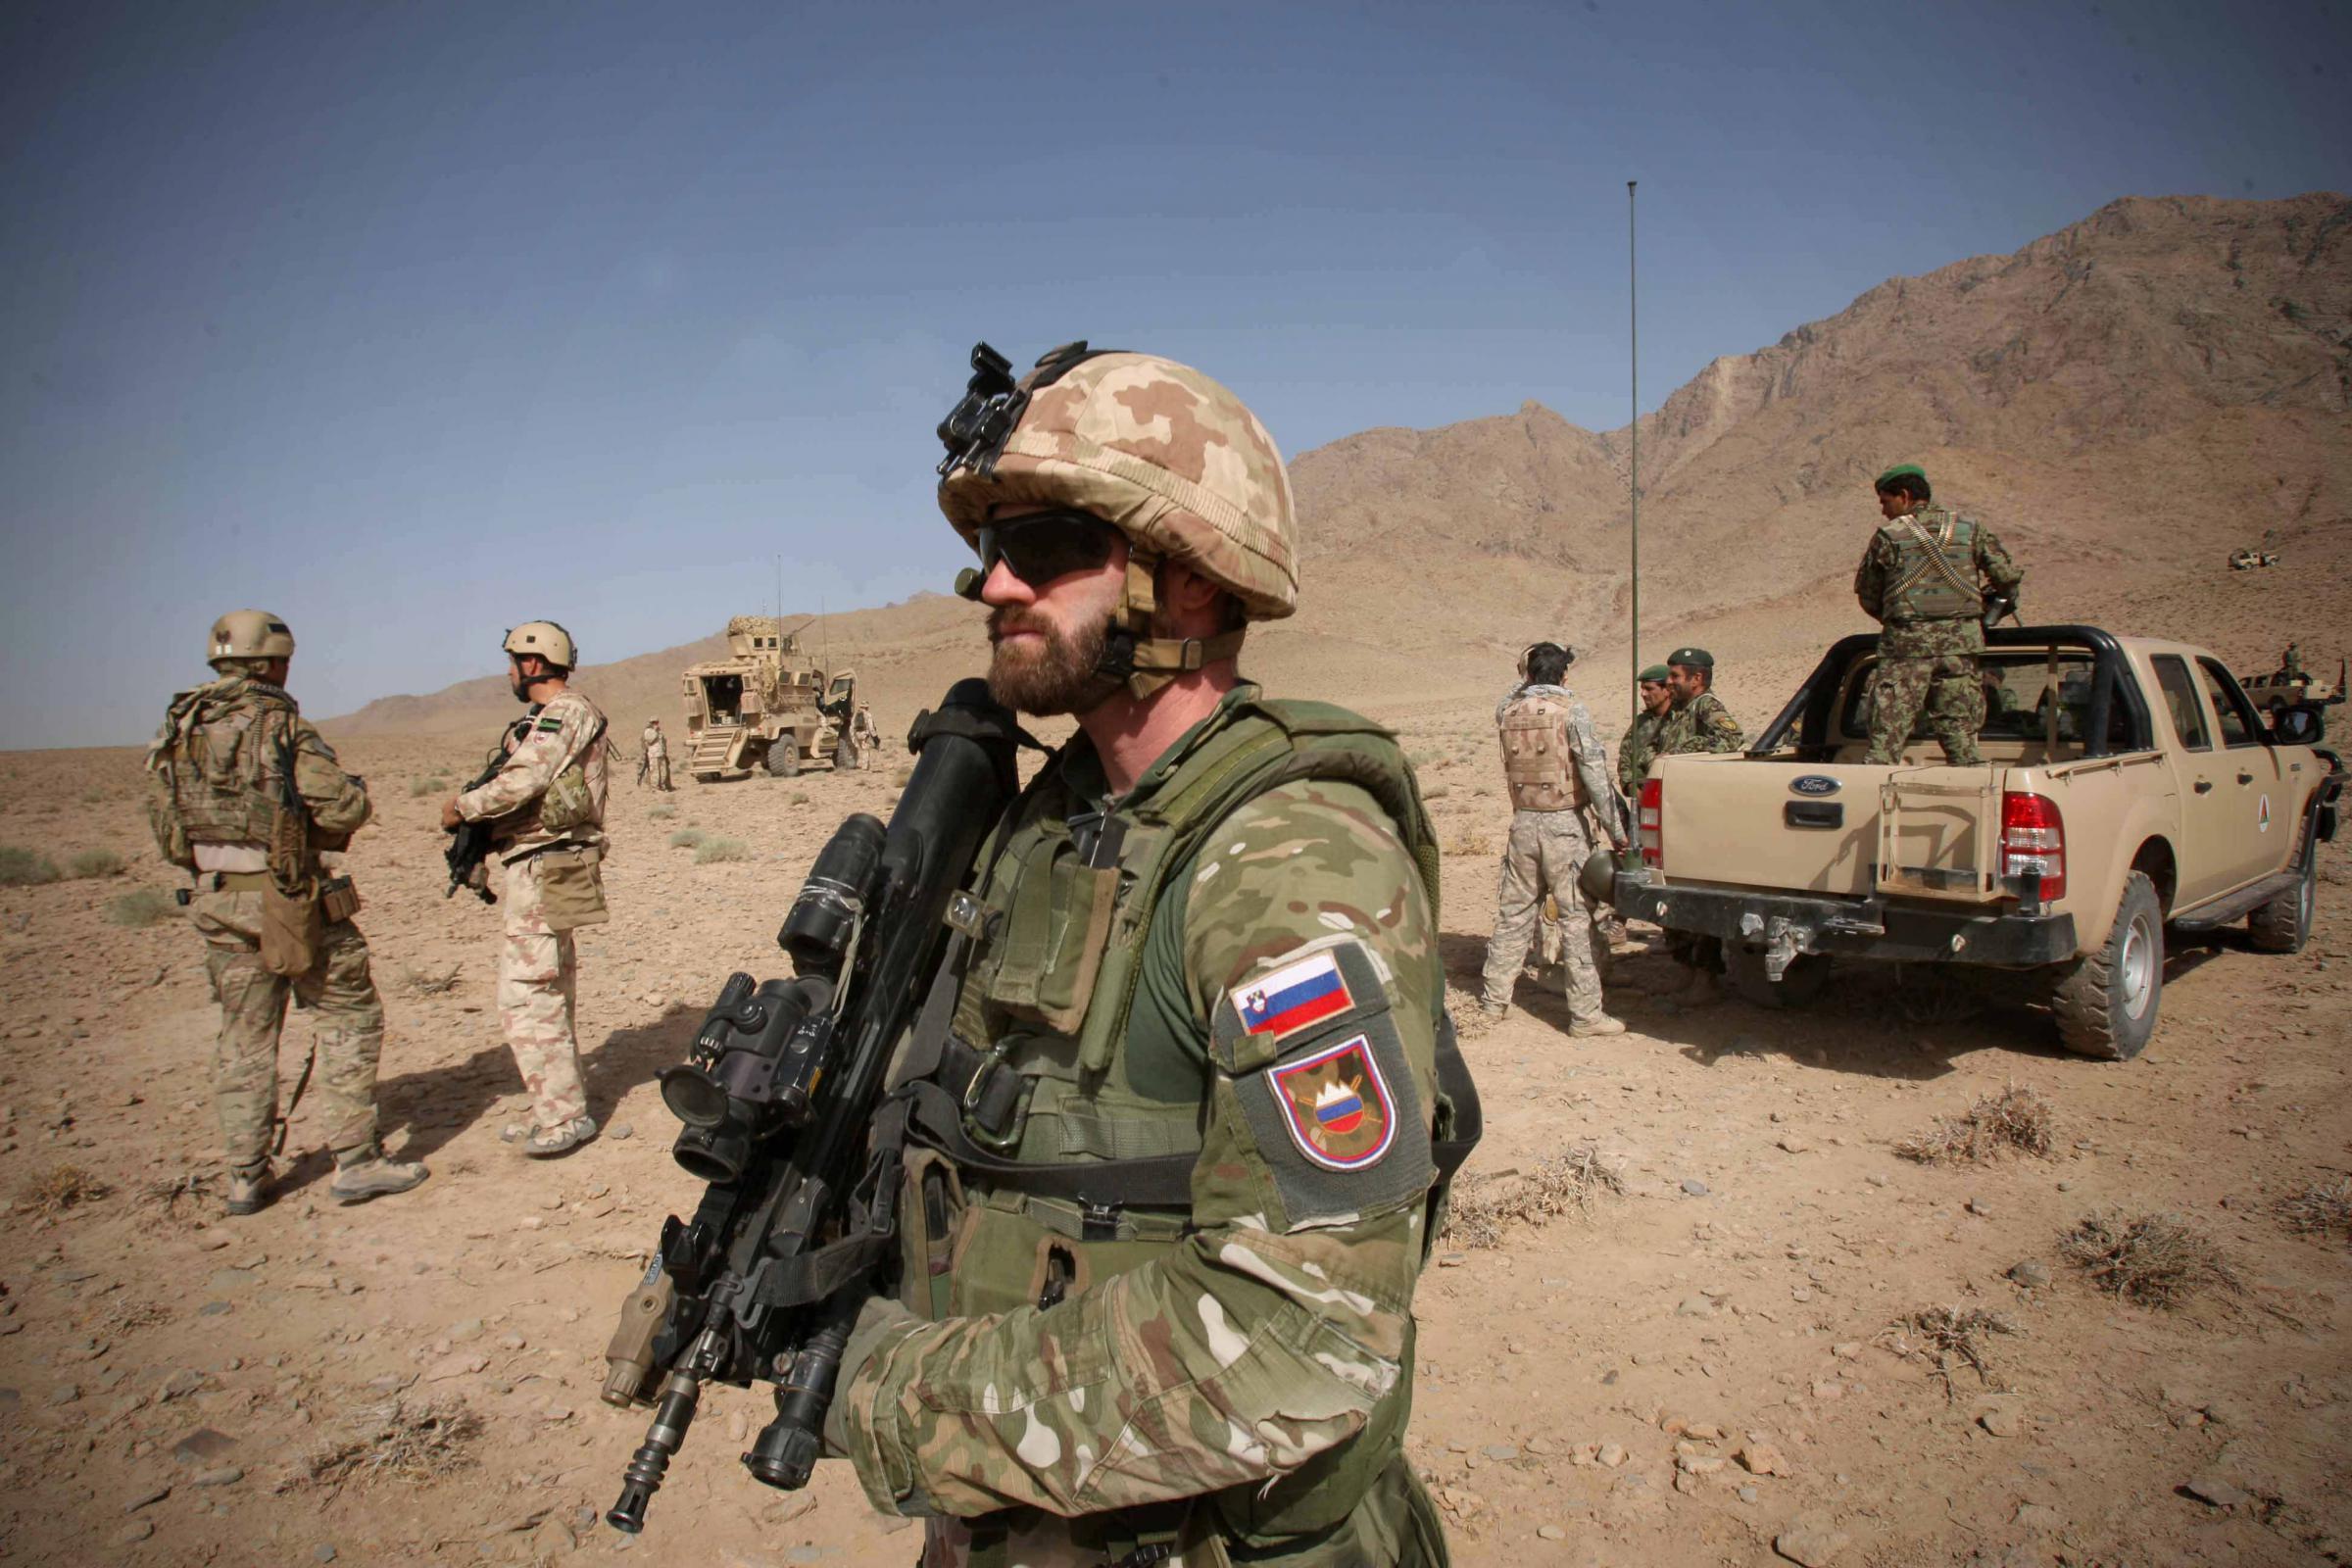 Pripadnik SV v Afganistanu  Vir:SV